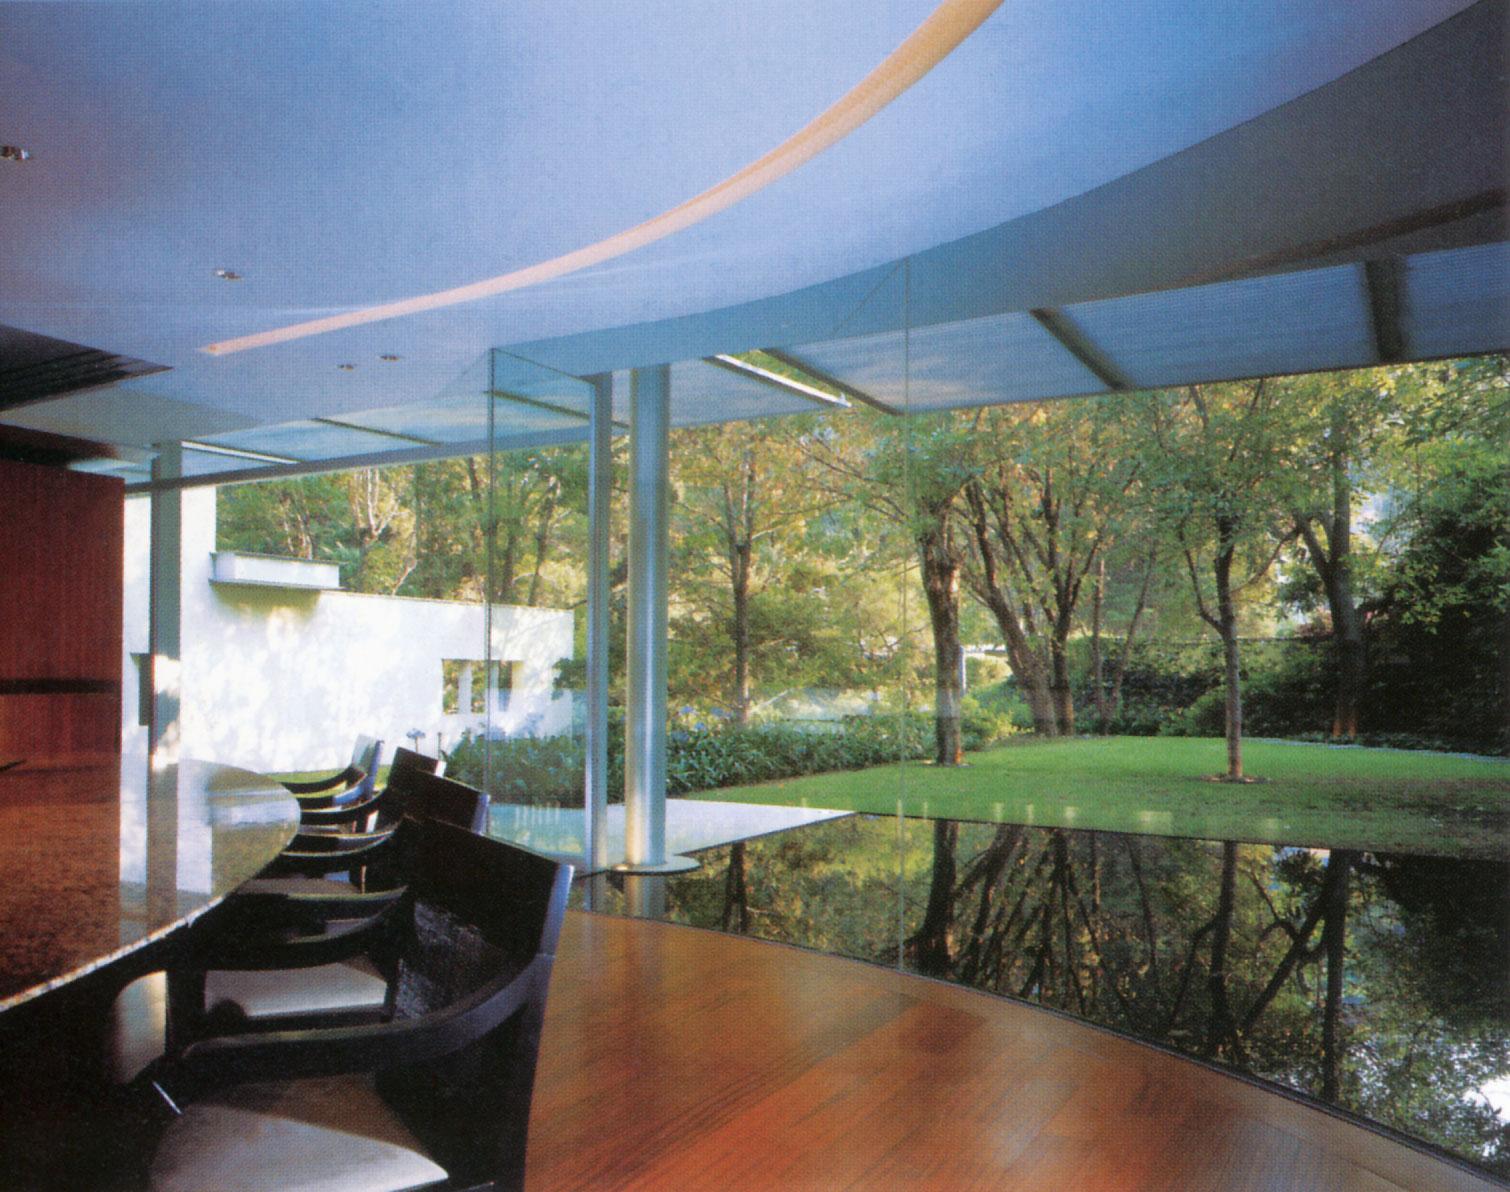 گروه معماری اِل.بی.سی، خانهی اسکوندیدو ریور، مکزیکو سیتی، 2003